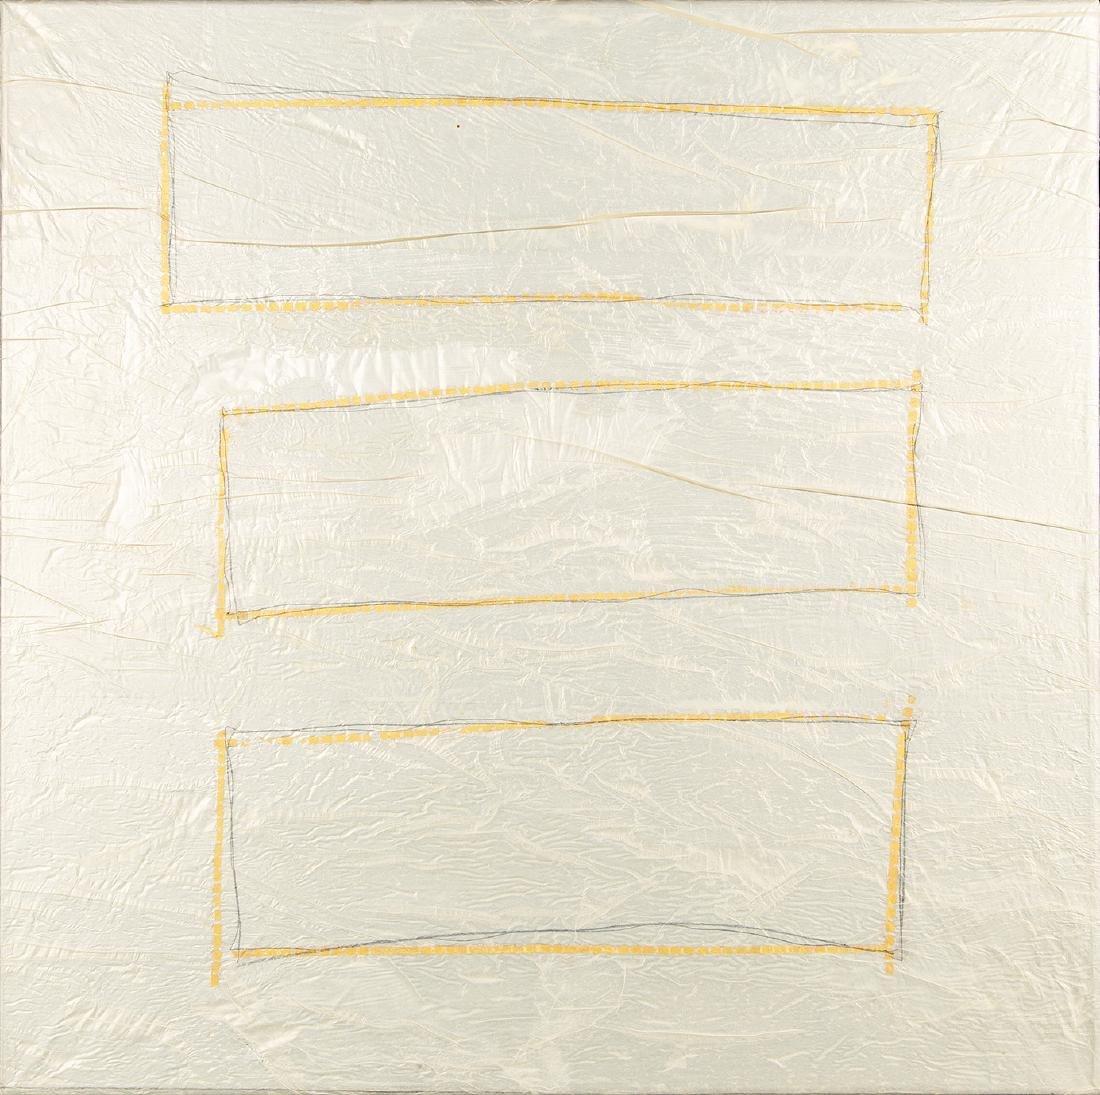 RUDI STANZEL - (1958 LINZ) - THEO D'ORO, 1997